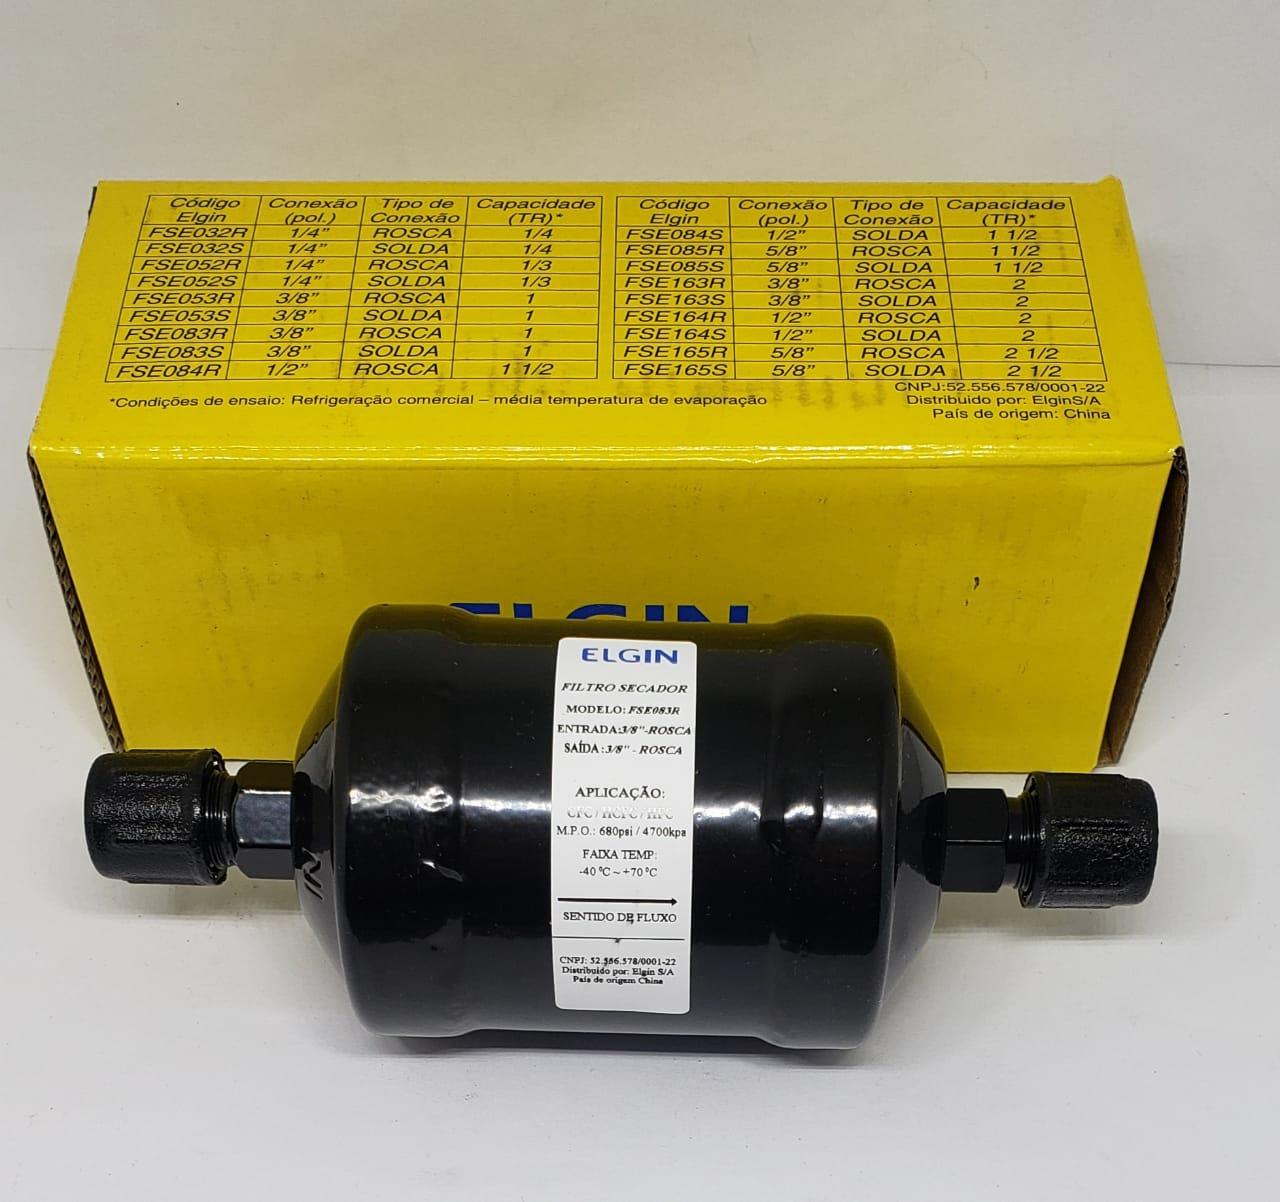 Filtro Secador com Rosca 3/8 X 160 Fse083r Elgin